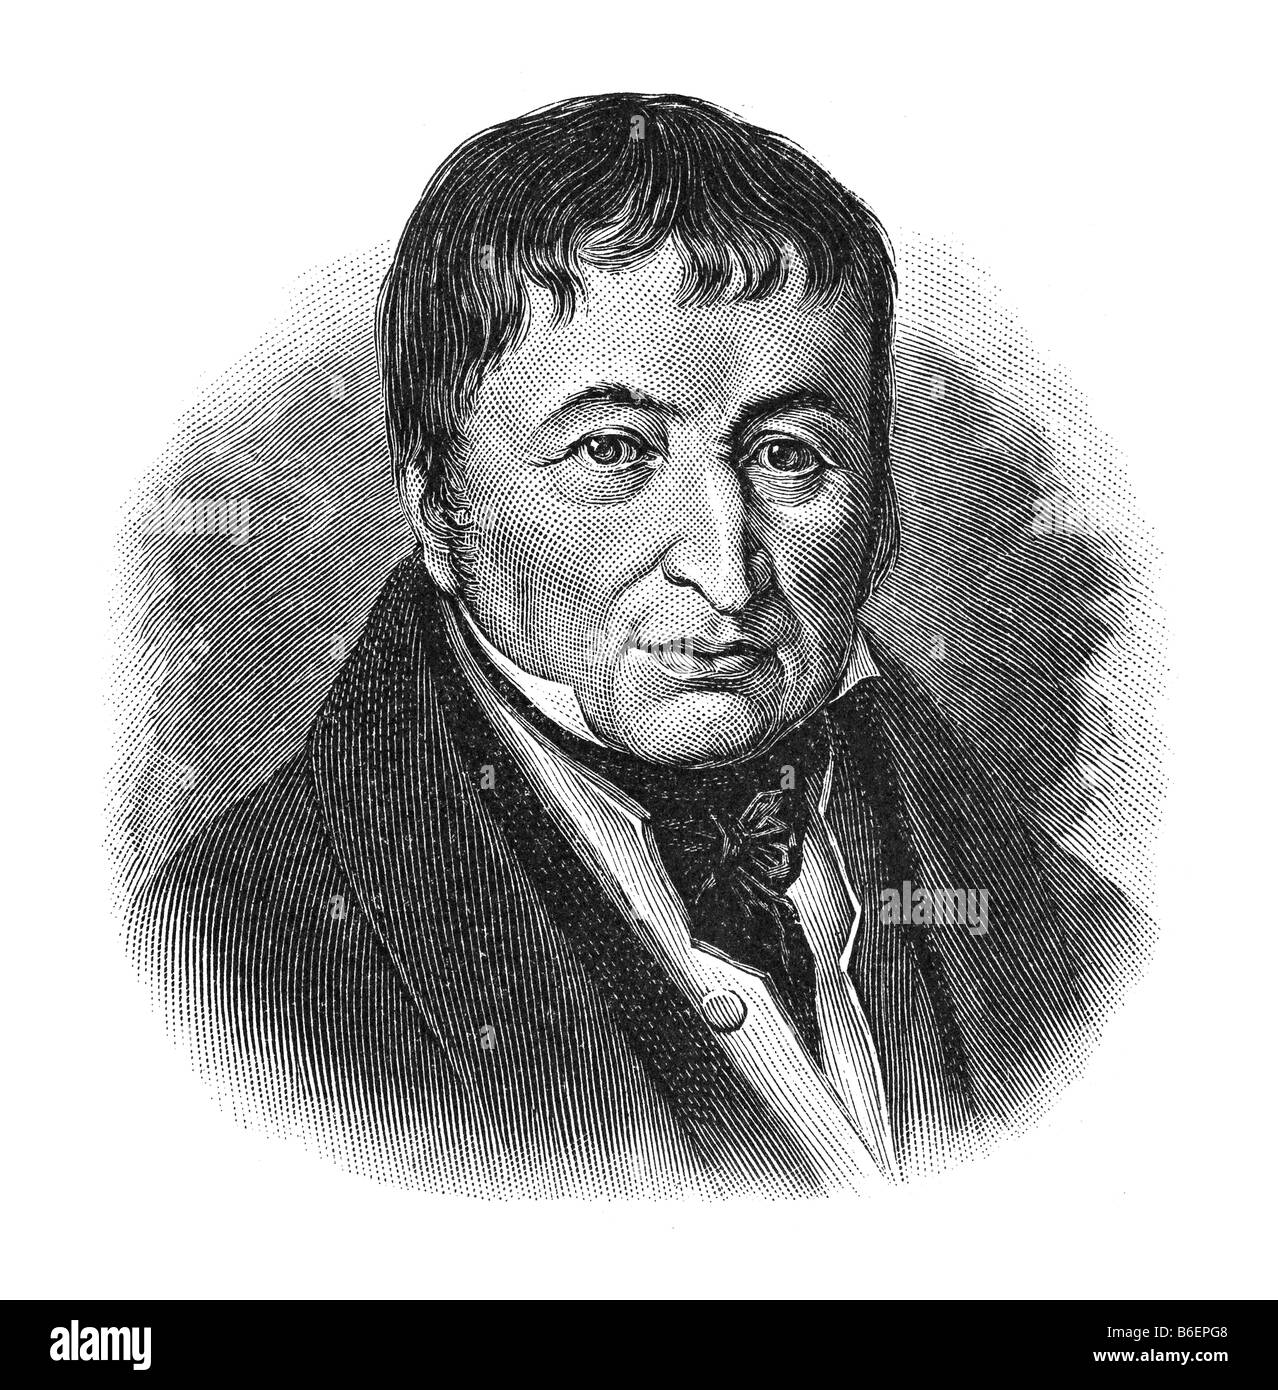 Johann Friedrich Gottlob Koenig, 17. April 1774 Eisleben - 17. January 1833 Oberzell near Wuerzburg - Stock Image